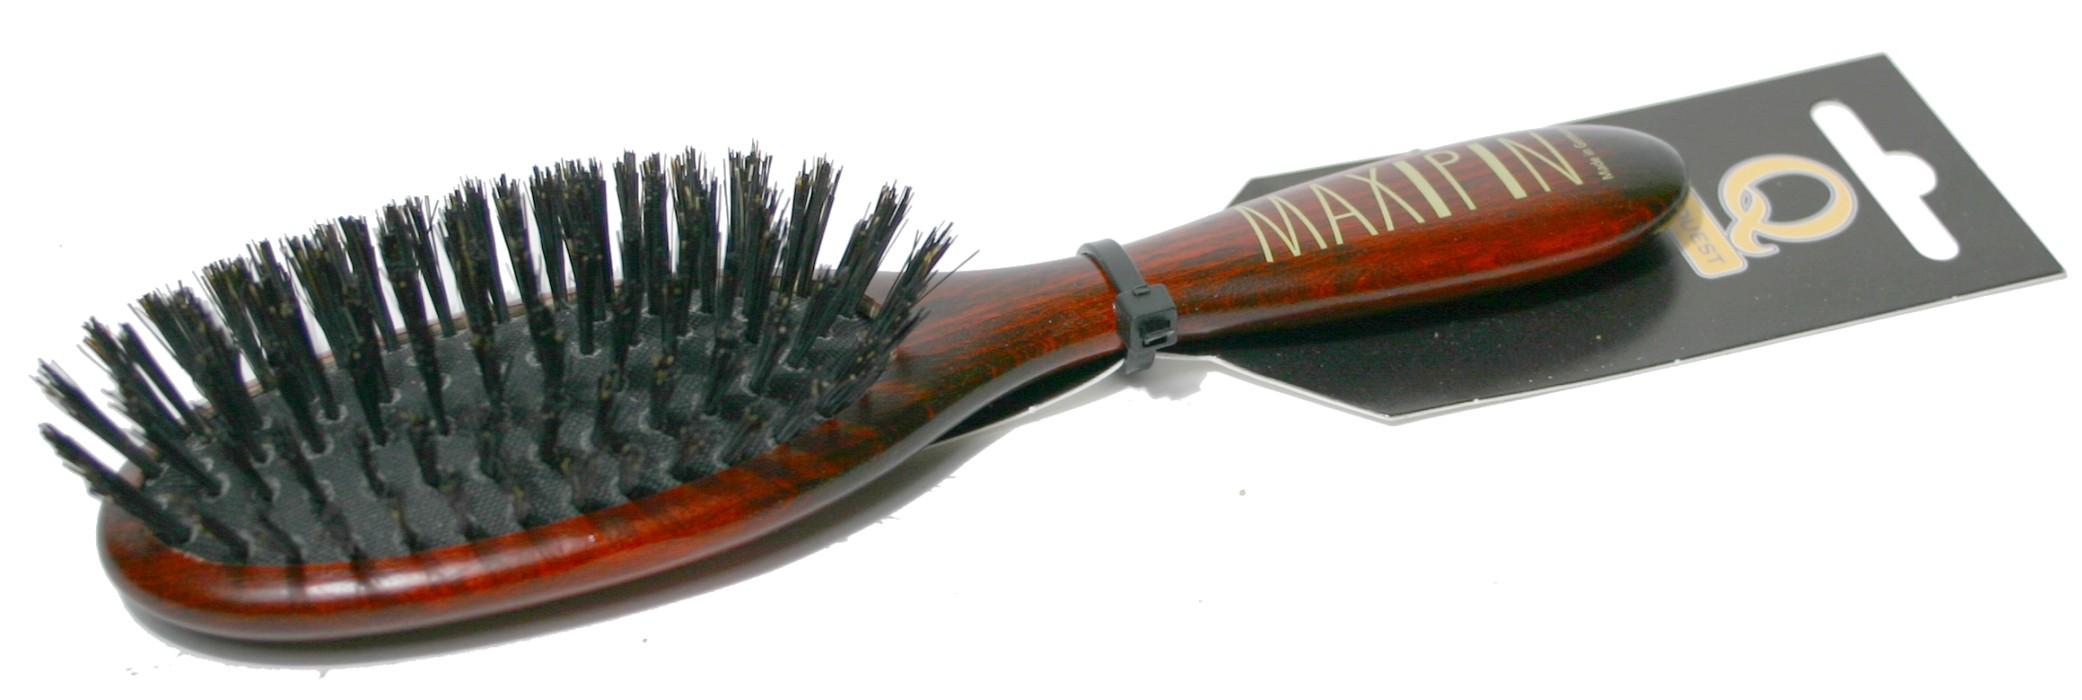 MaxiPin Borste Äkta vildsvin Gles Oval 18,5xcm